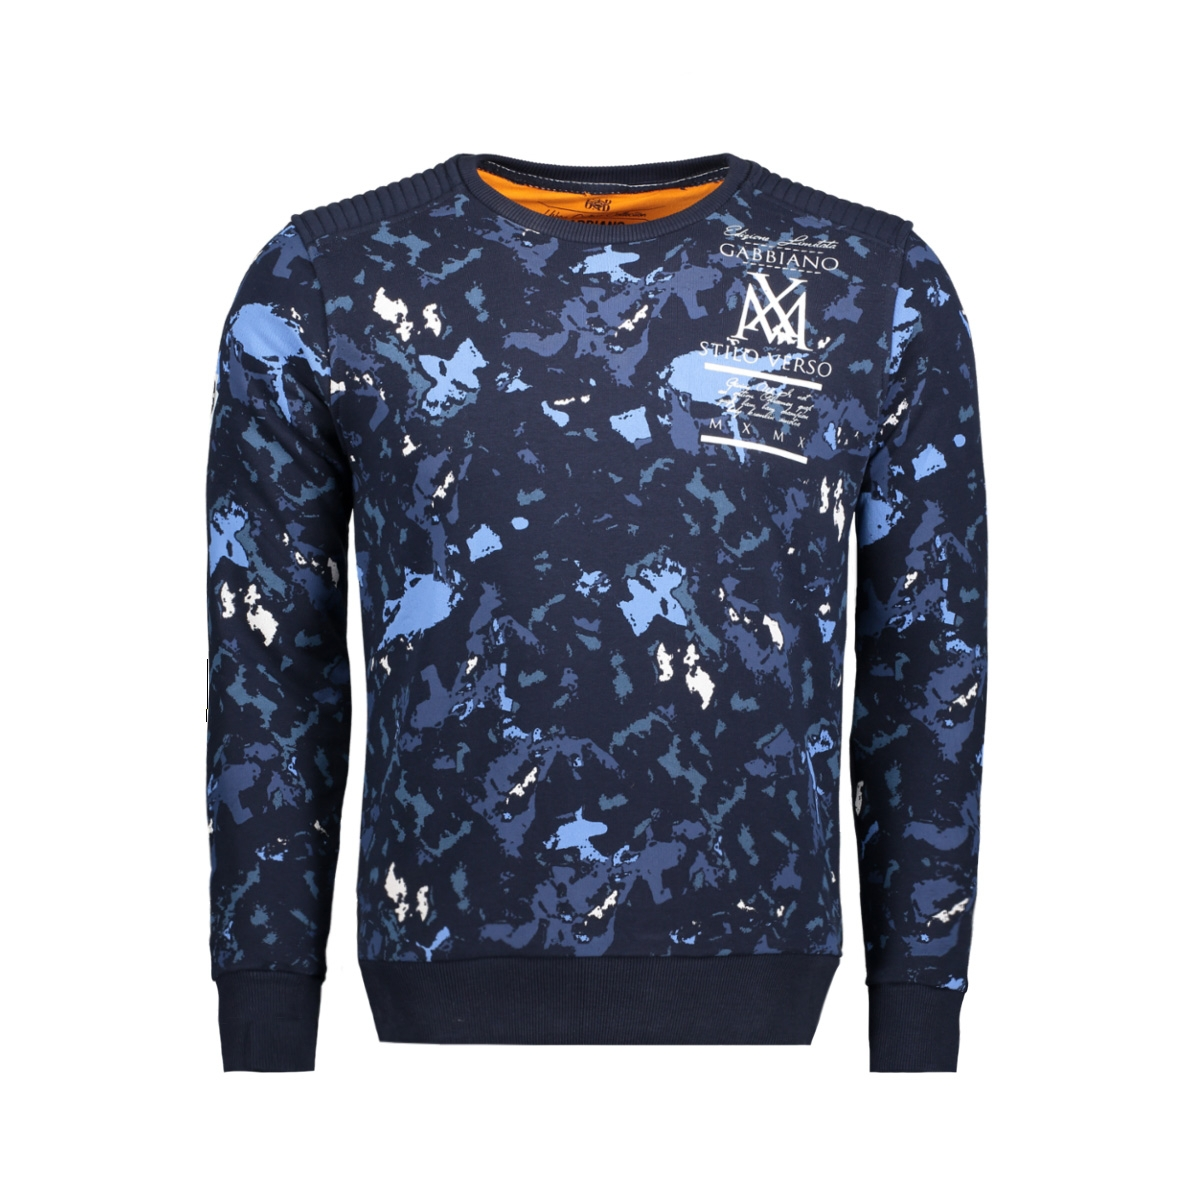 76114 gabbiano sweater navy